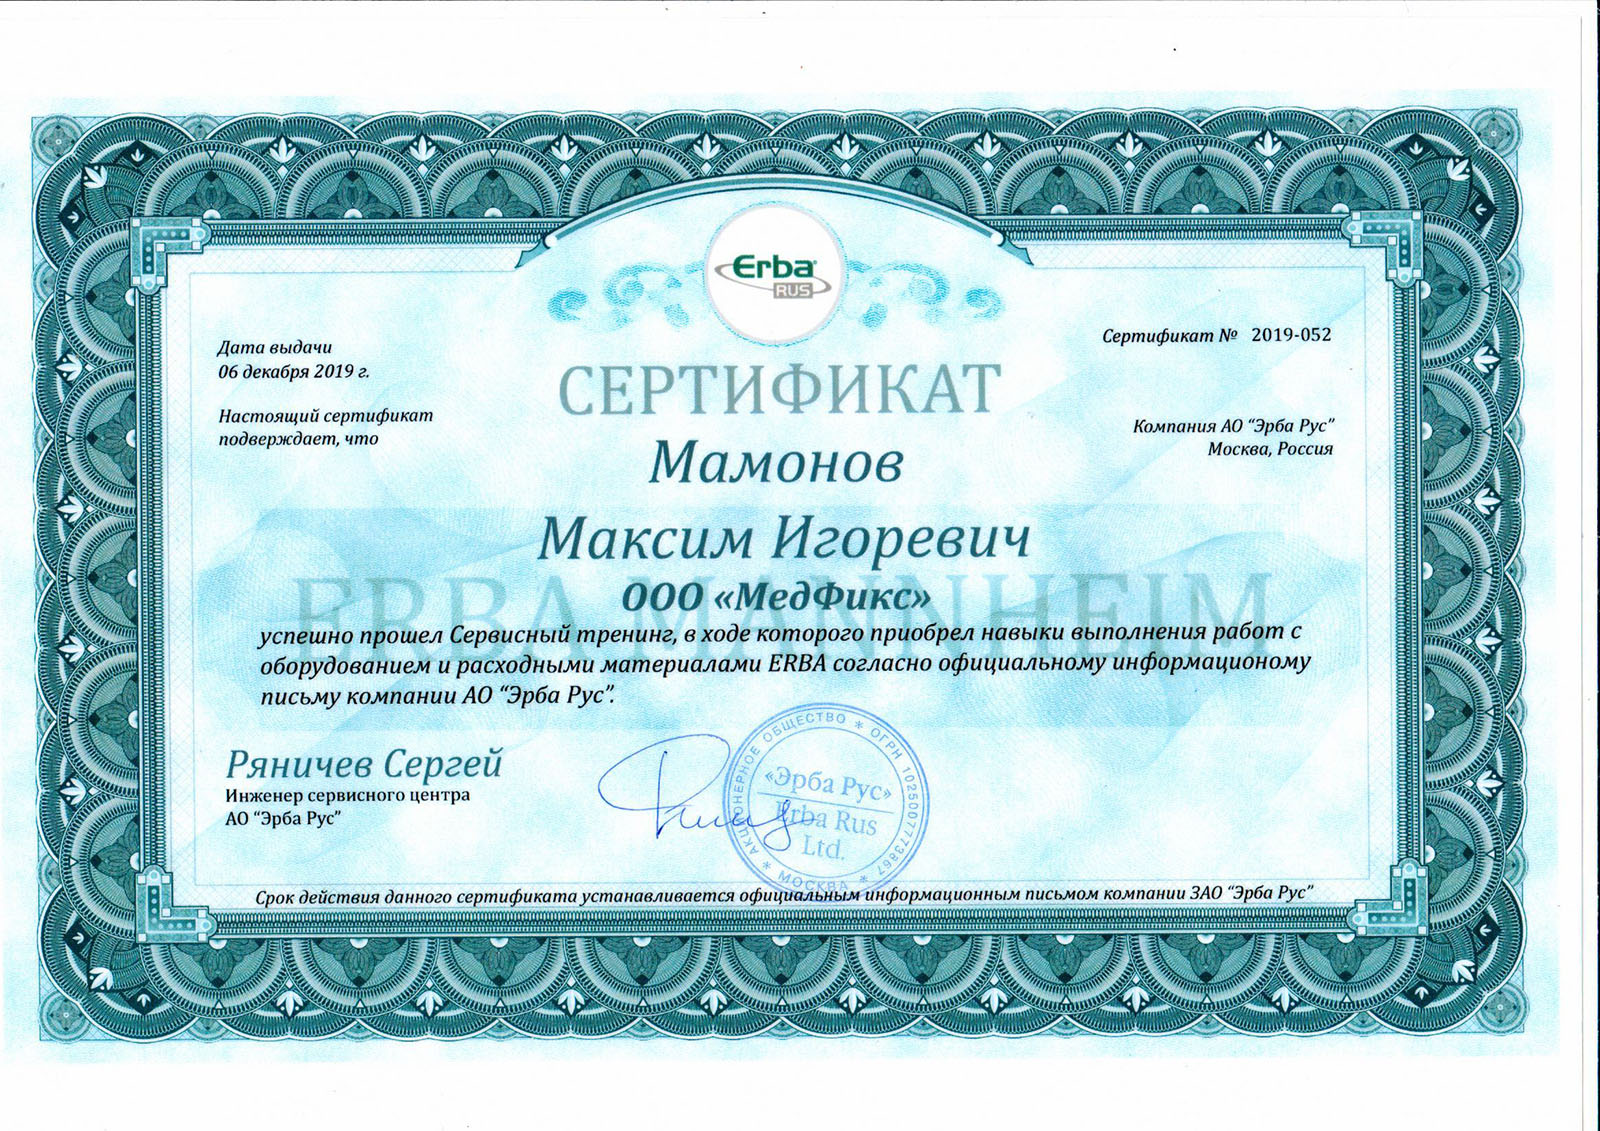 laboratornoe-oborudovanie - Erba-Mamonov-06.12.2019